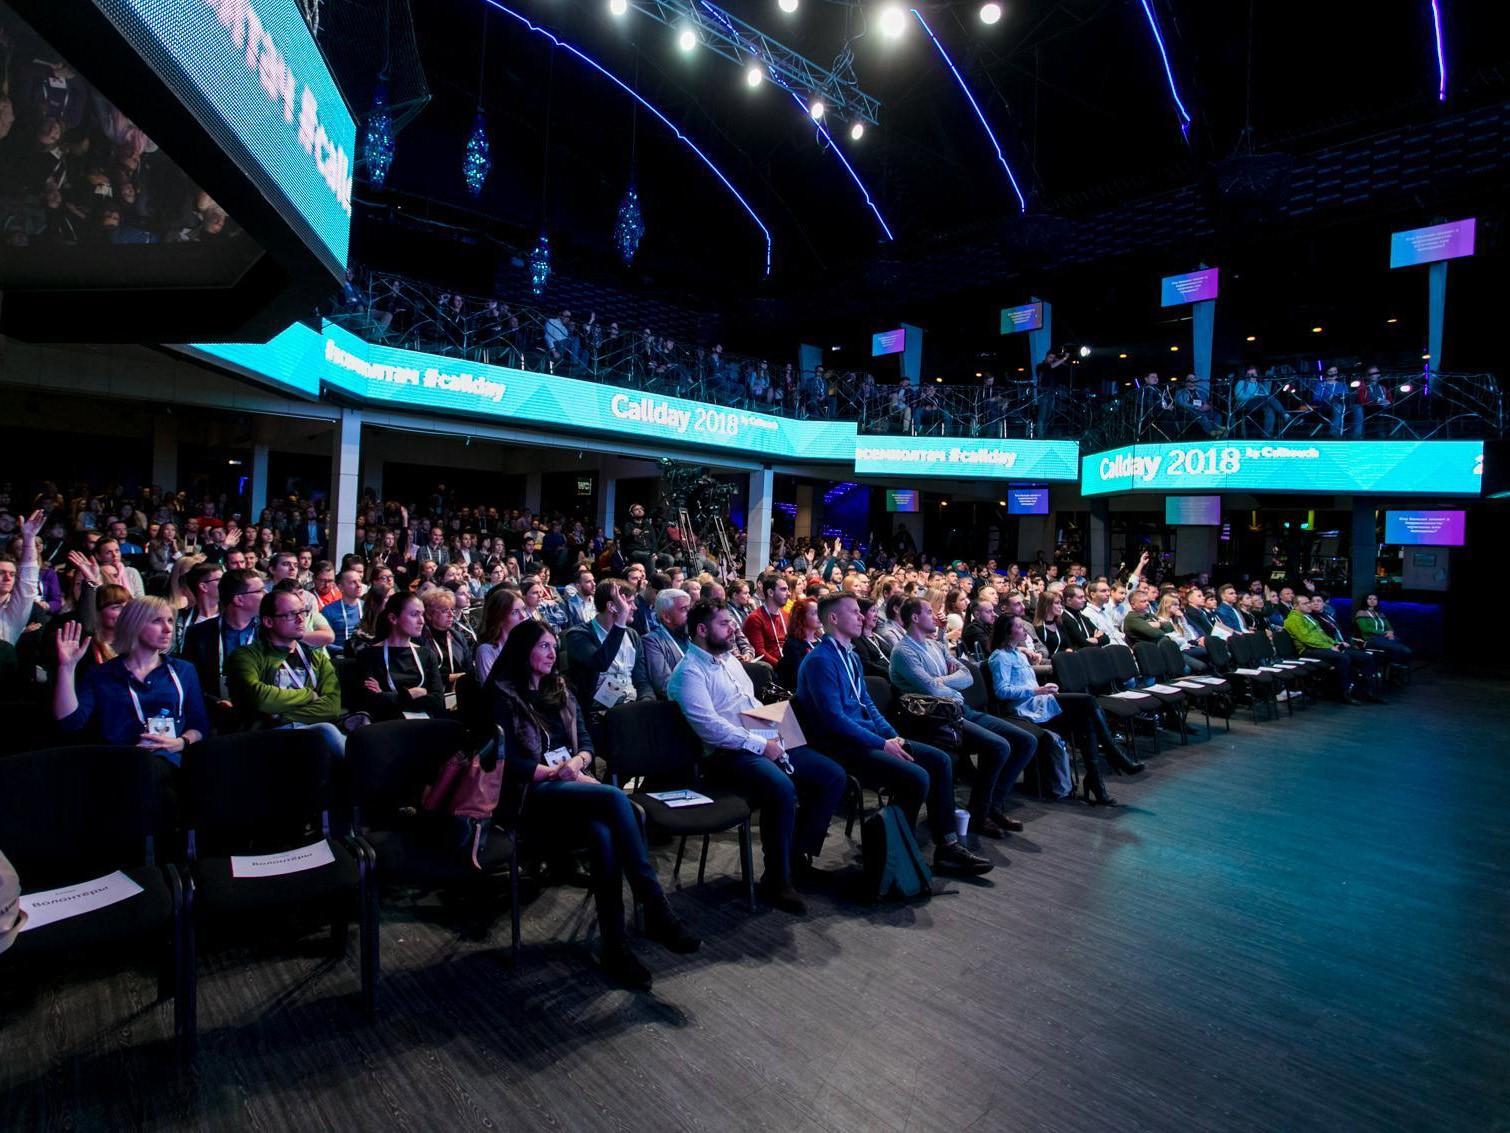 Calltouch и МегаФон проведут крупнейшую конференцию про бизнес, маркетинг и сквозную аналитику – Callday 2019